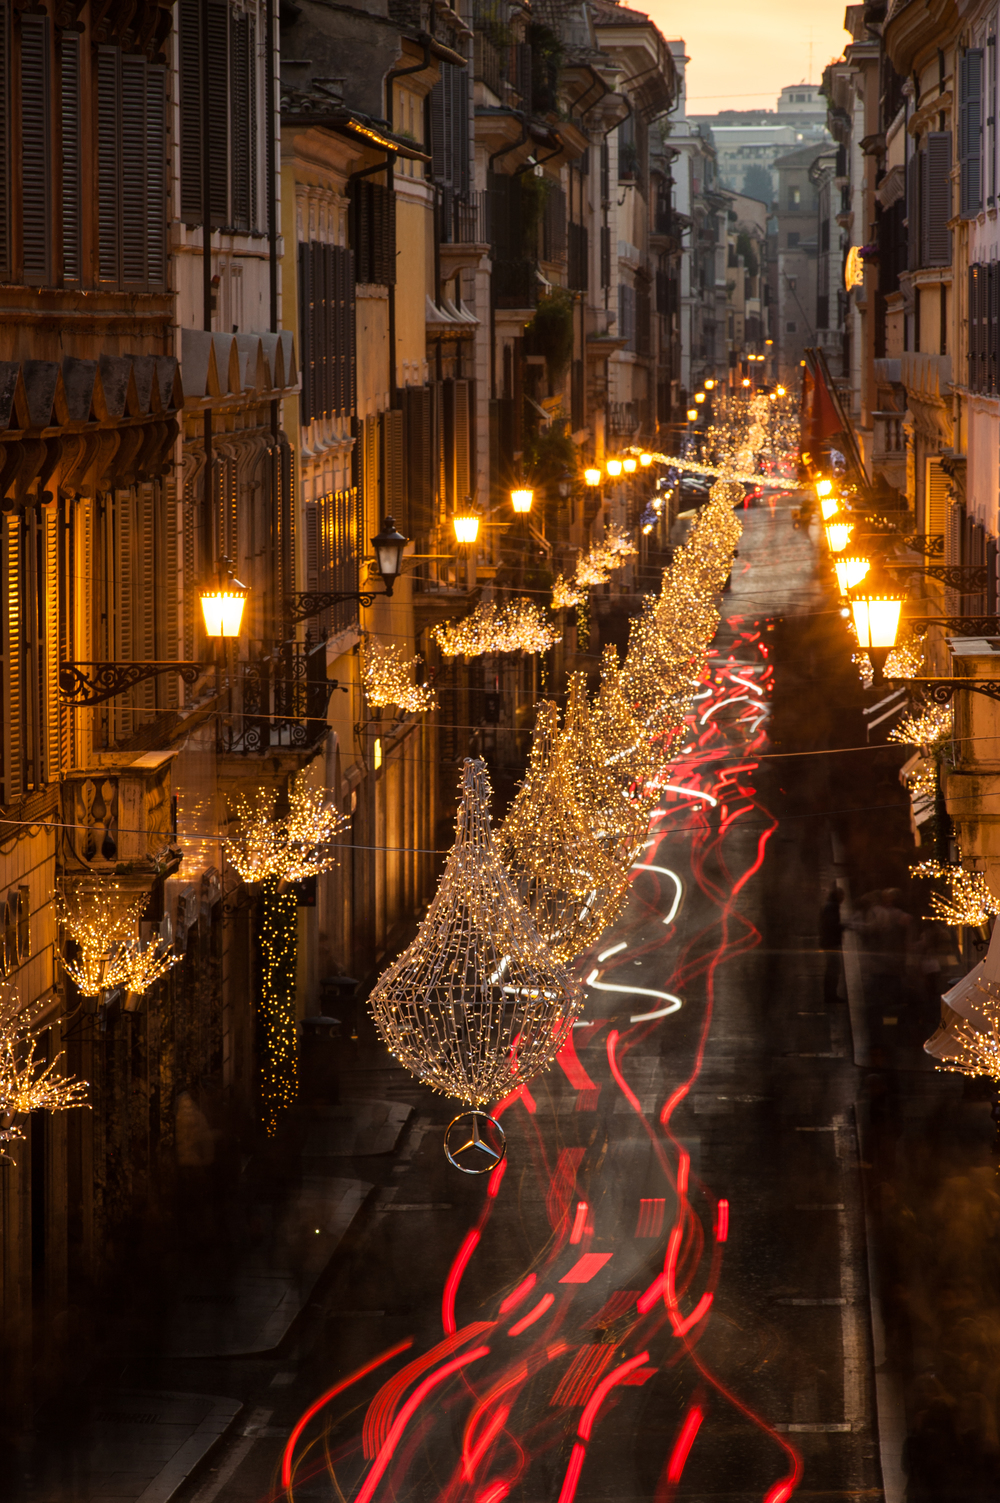 Via Condotti - Rome, Italy.